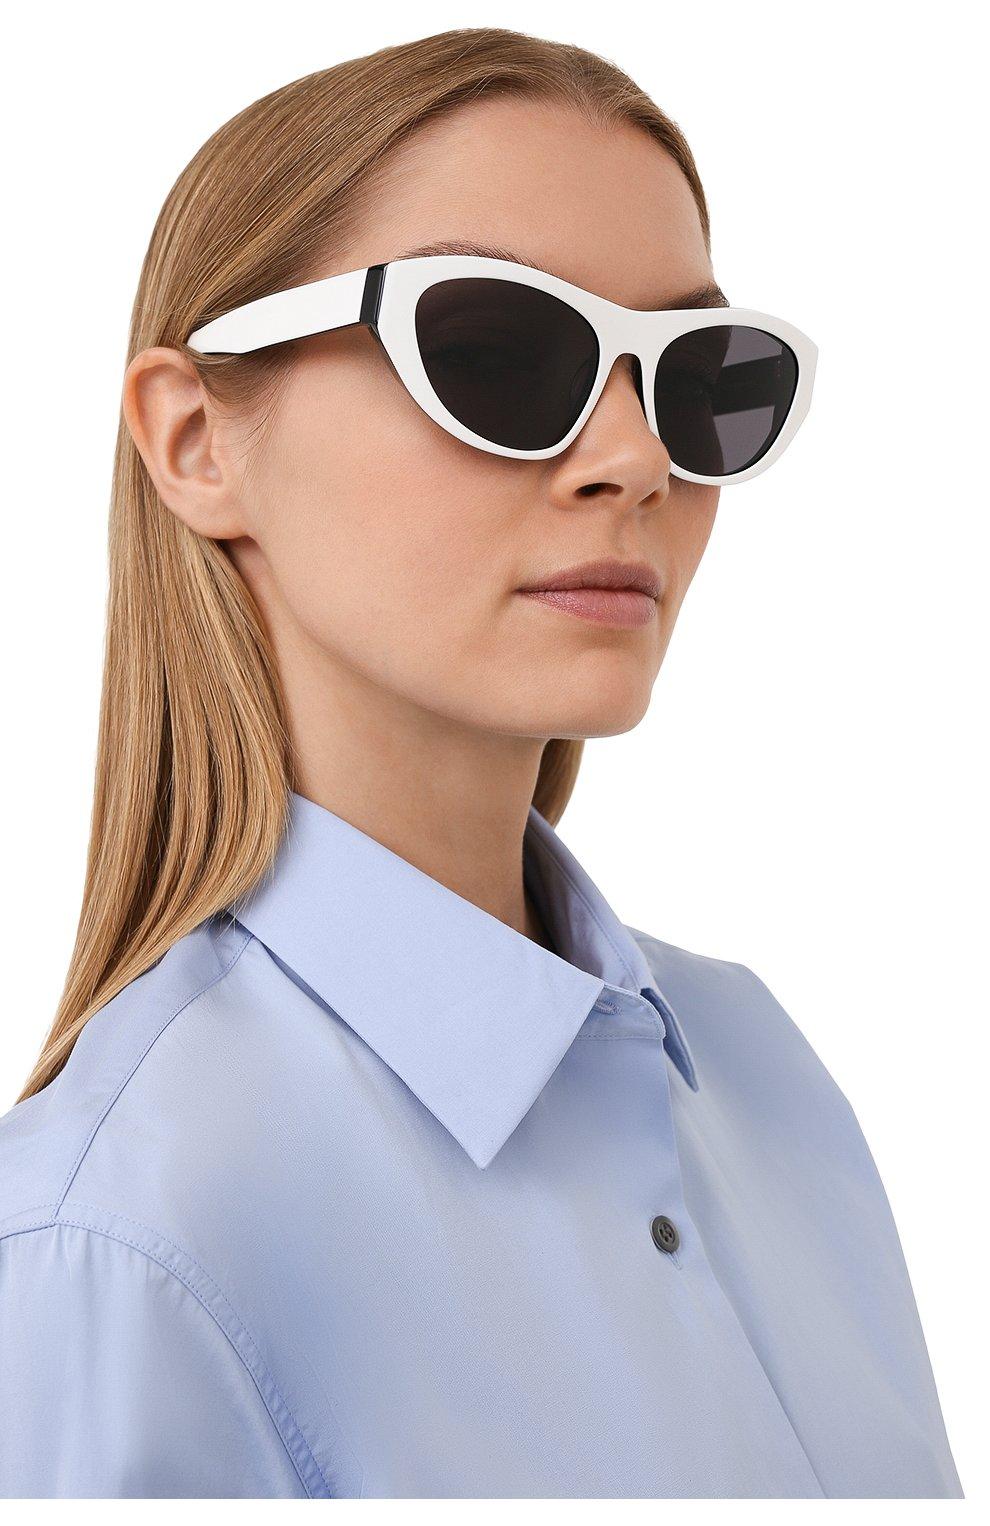 Женские солнцезащитные очки GCDS черно-белого цвета, арт. GD0010 21A | Фото 2 (Тип очков: С/з; Очки форма: Cat-eye; Оптика Гендер: оптика-унисекс)